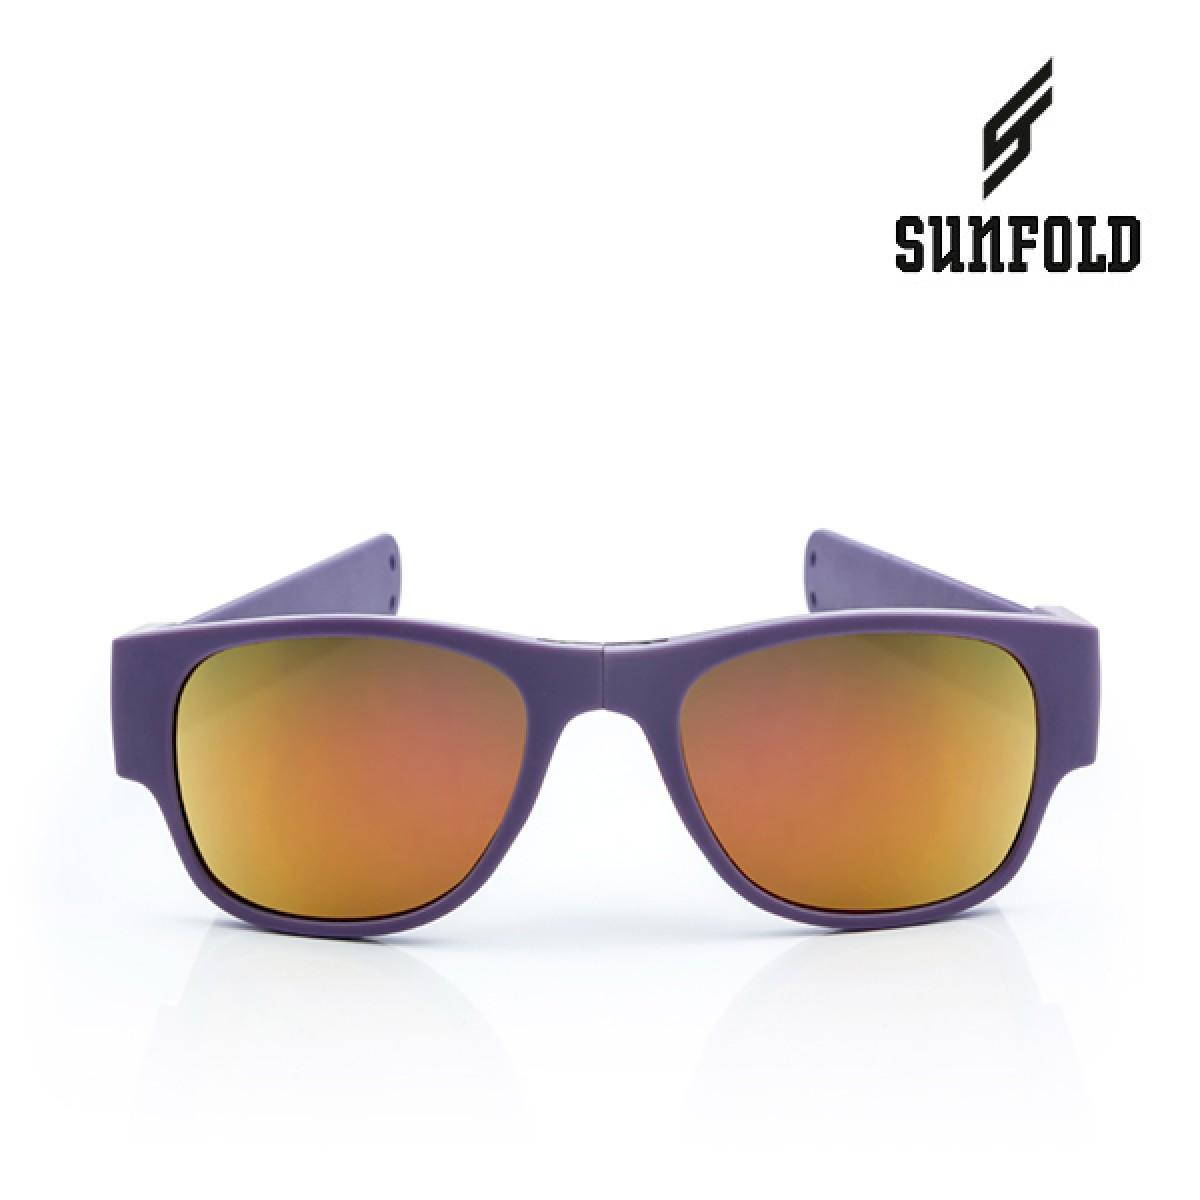 7f33a1dcd9cb Roll-up solbriller Sunfold ES1